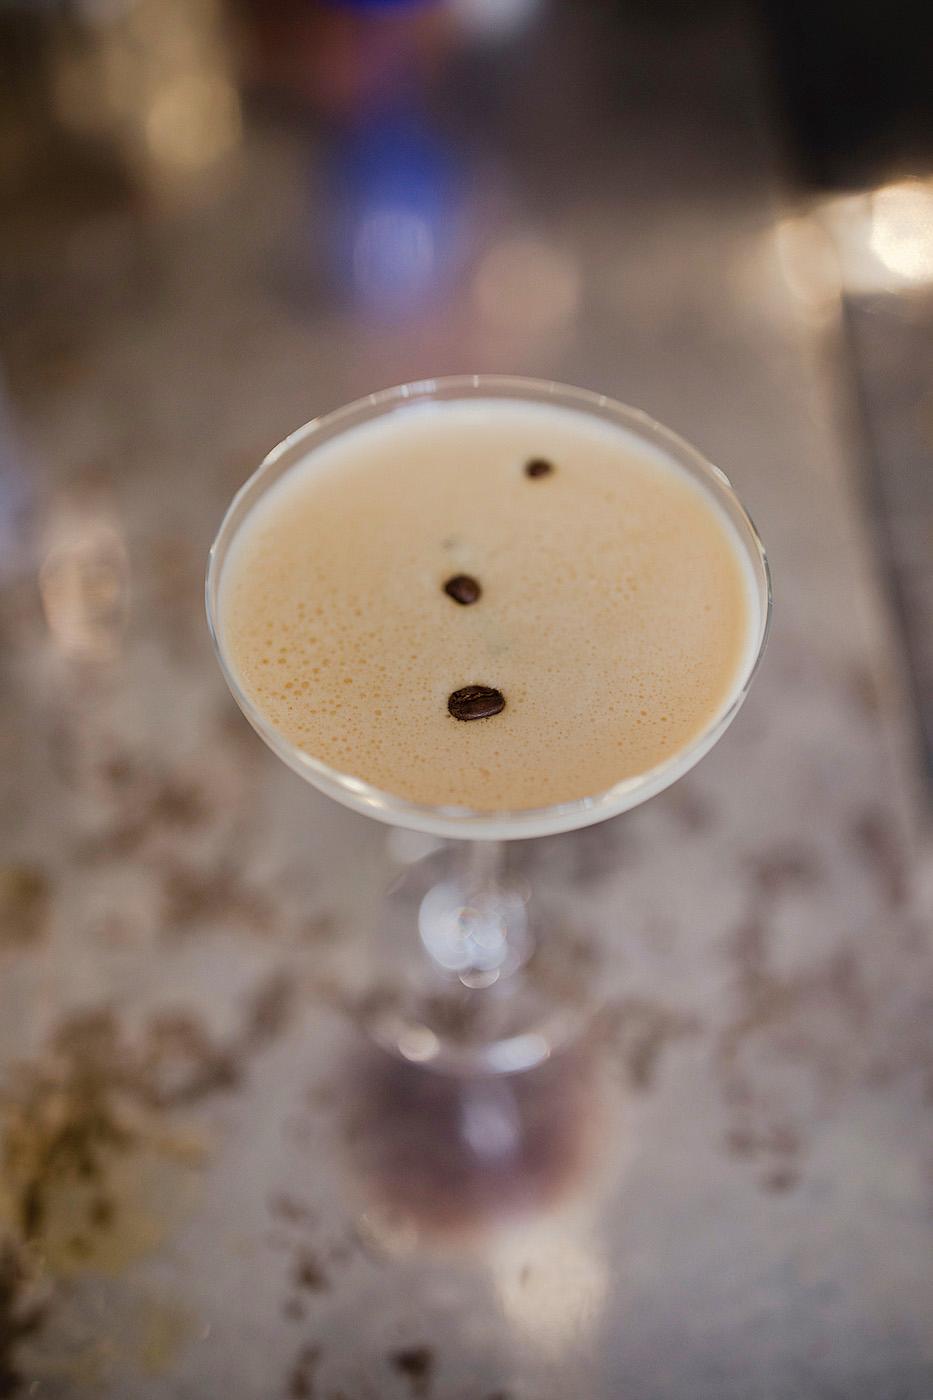 wwww.thegoldenbun.com |le logis grey goose vodka cognac francois thibault 41